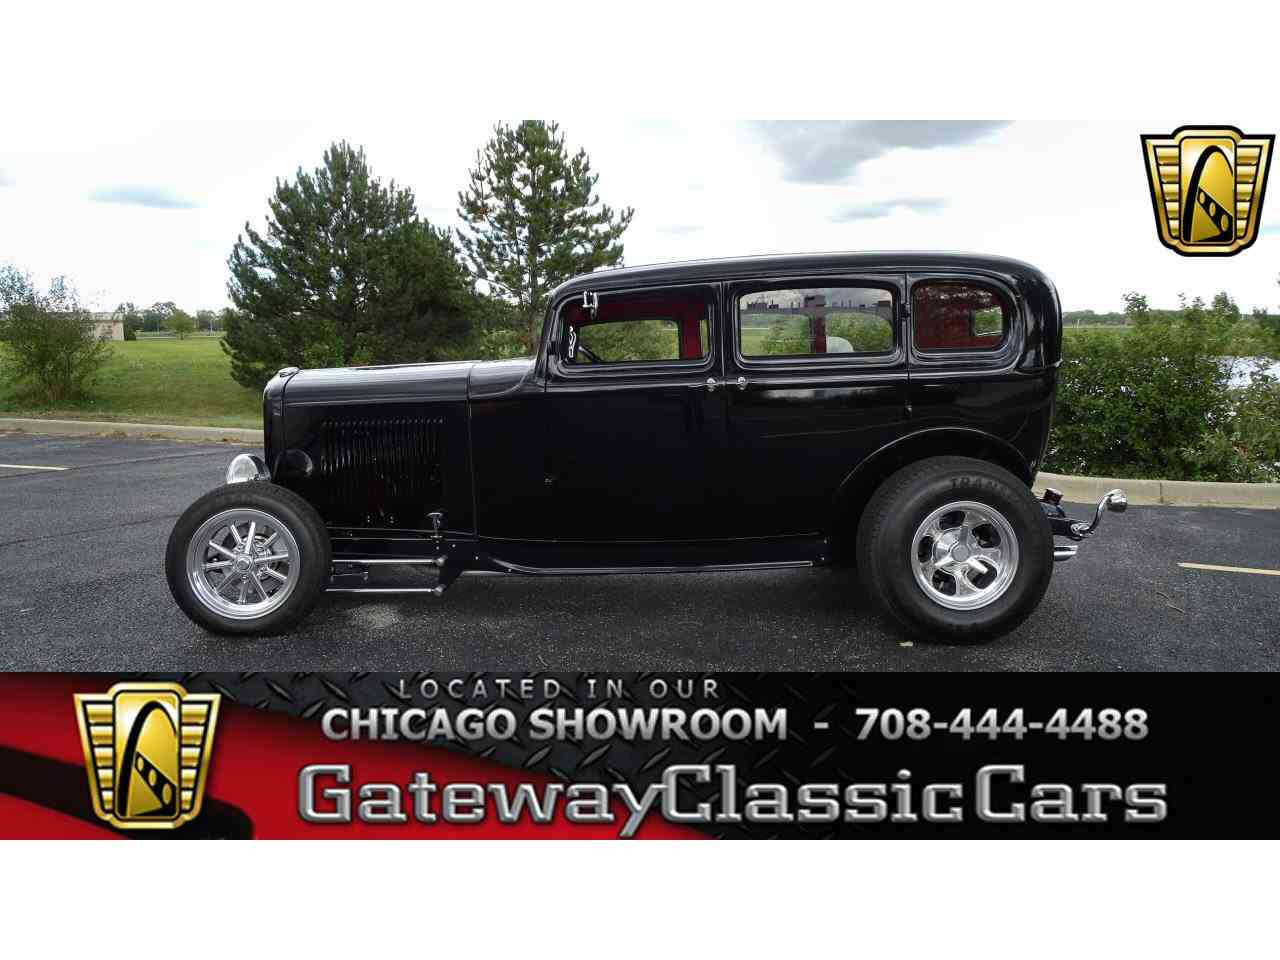 Large Picture of '32 4-Dr Sedan located in Crete Illinois - $73,000.00 - LTPB